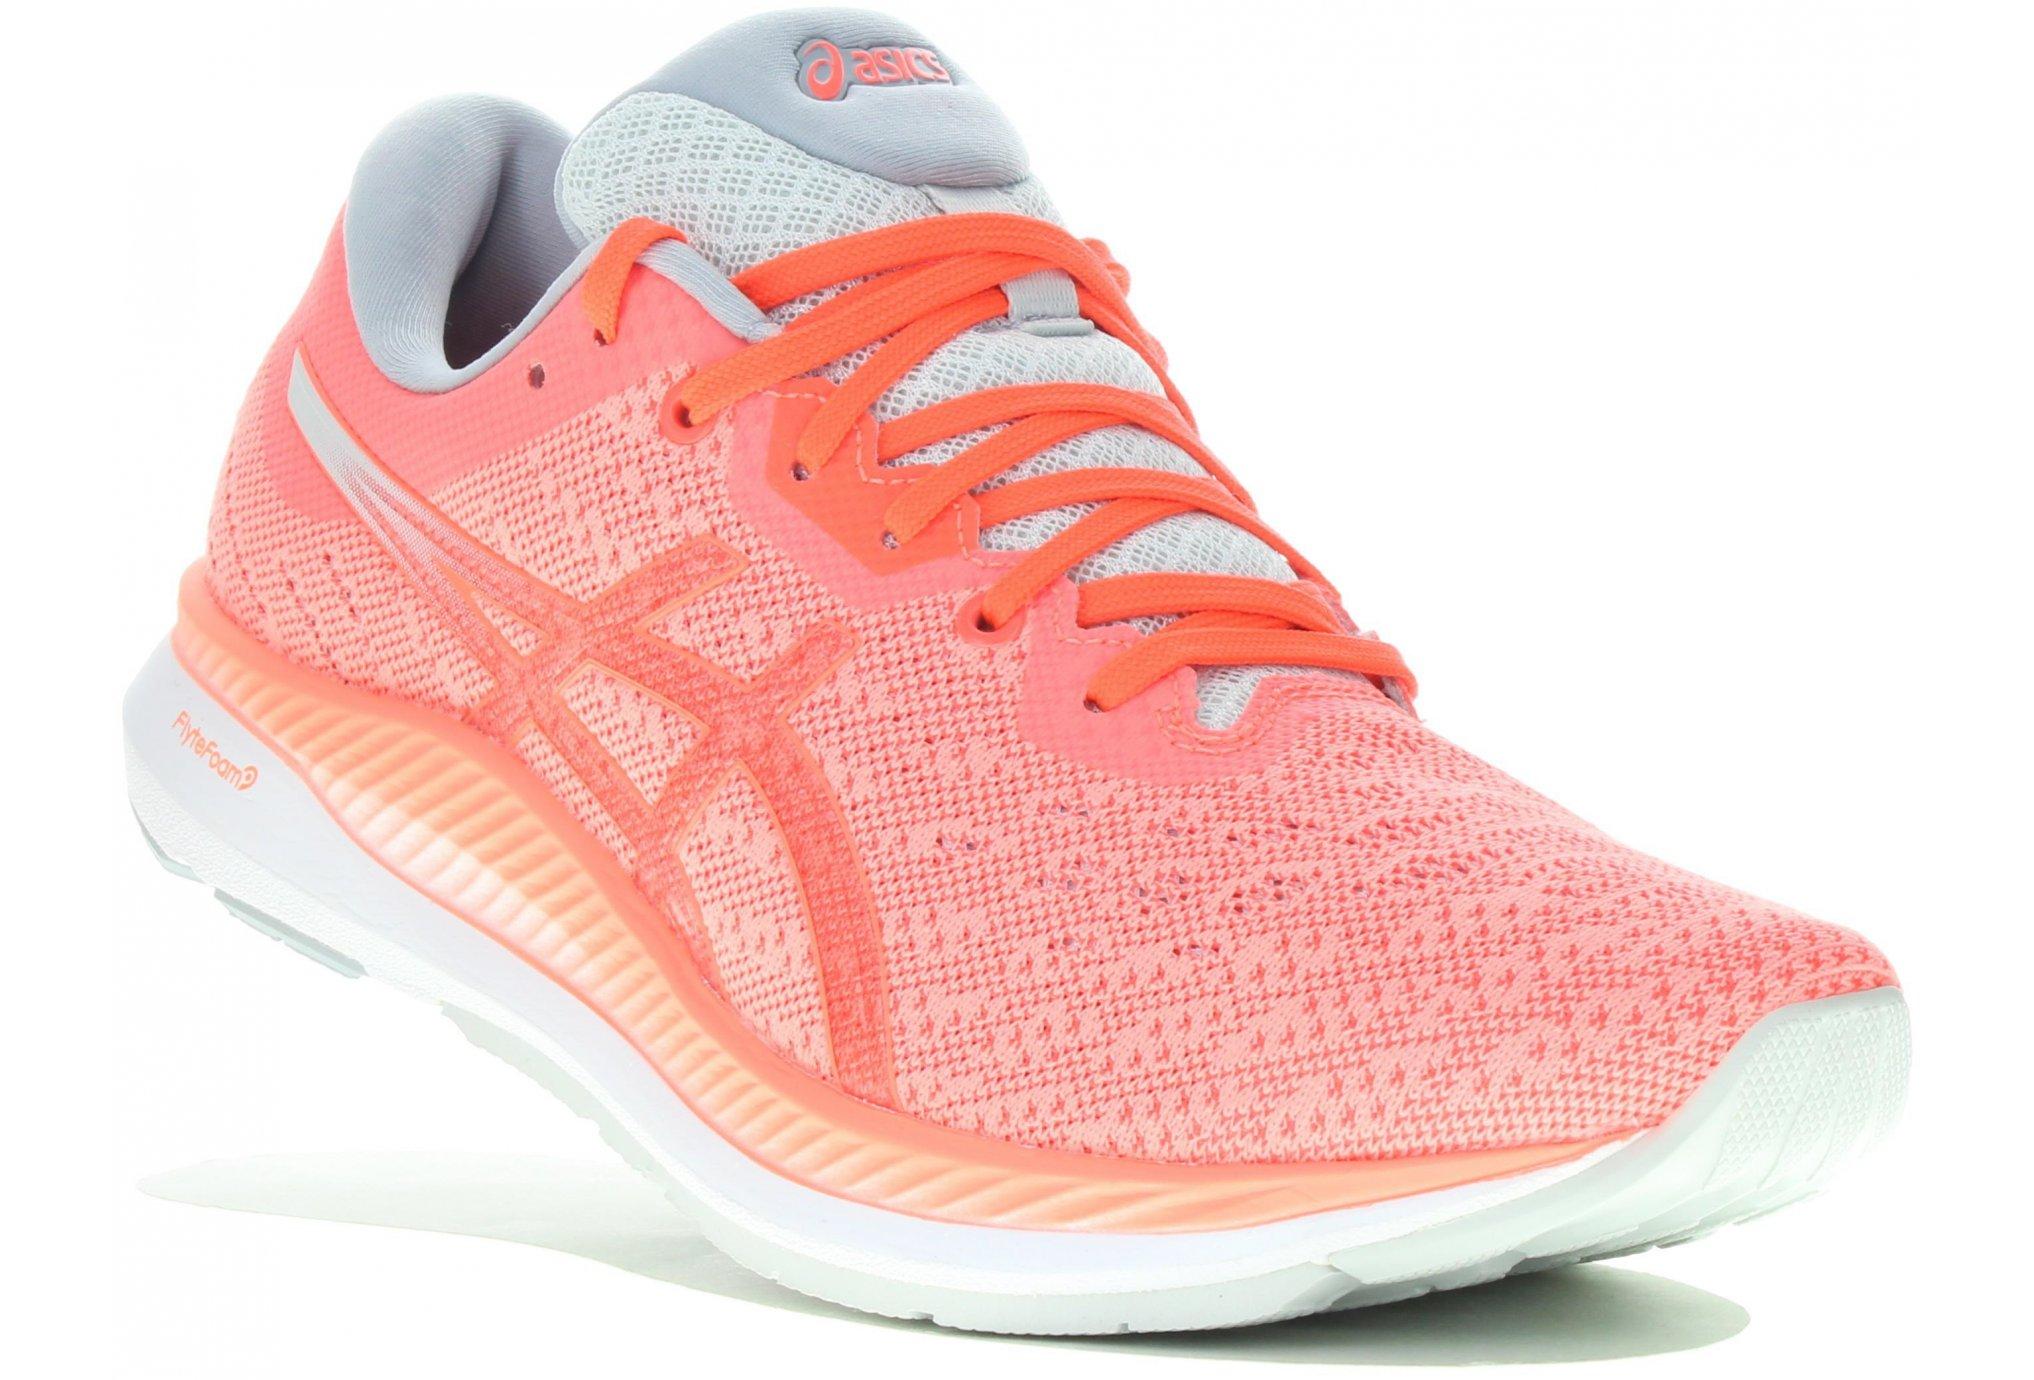 Asics EvoRide Chaussures running femme